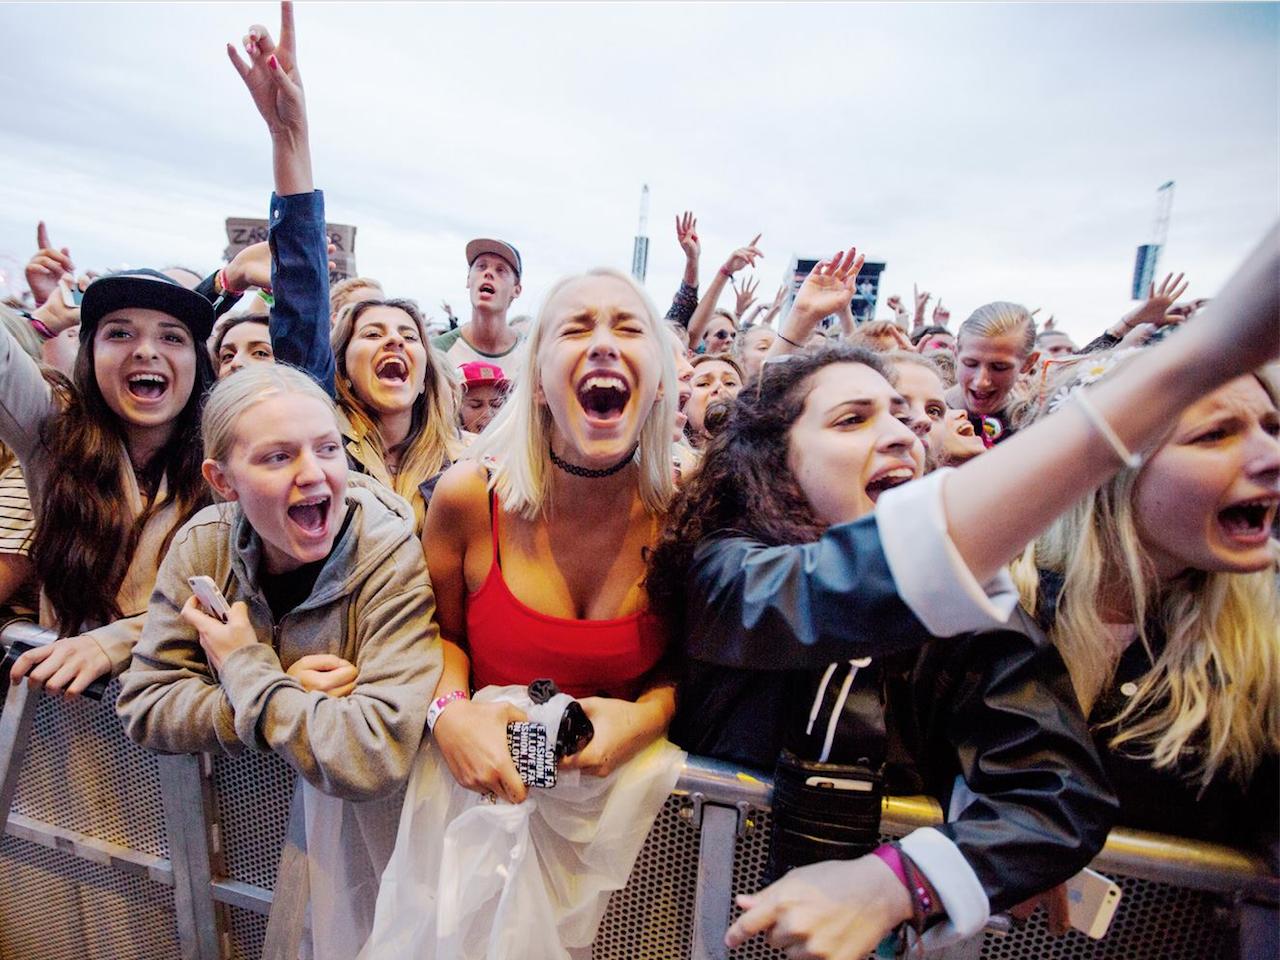 Sexfestival sverige